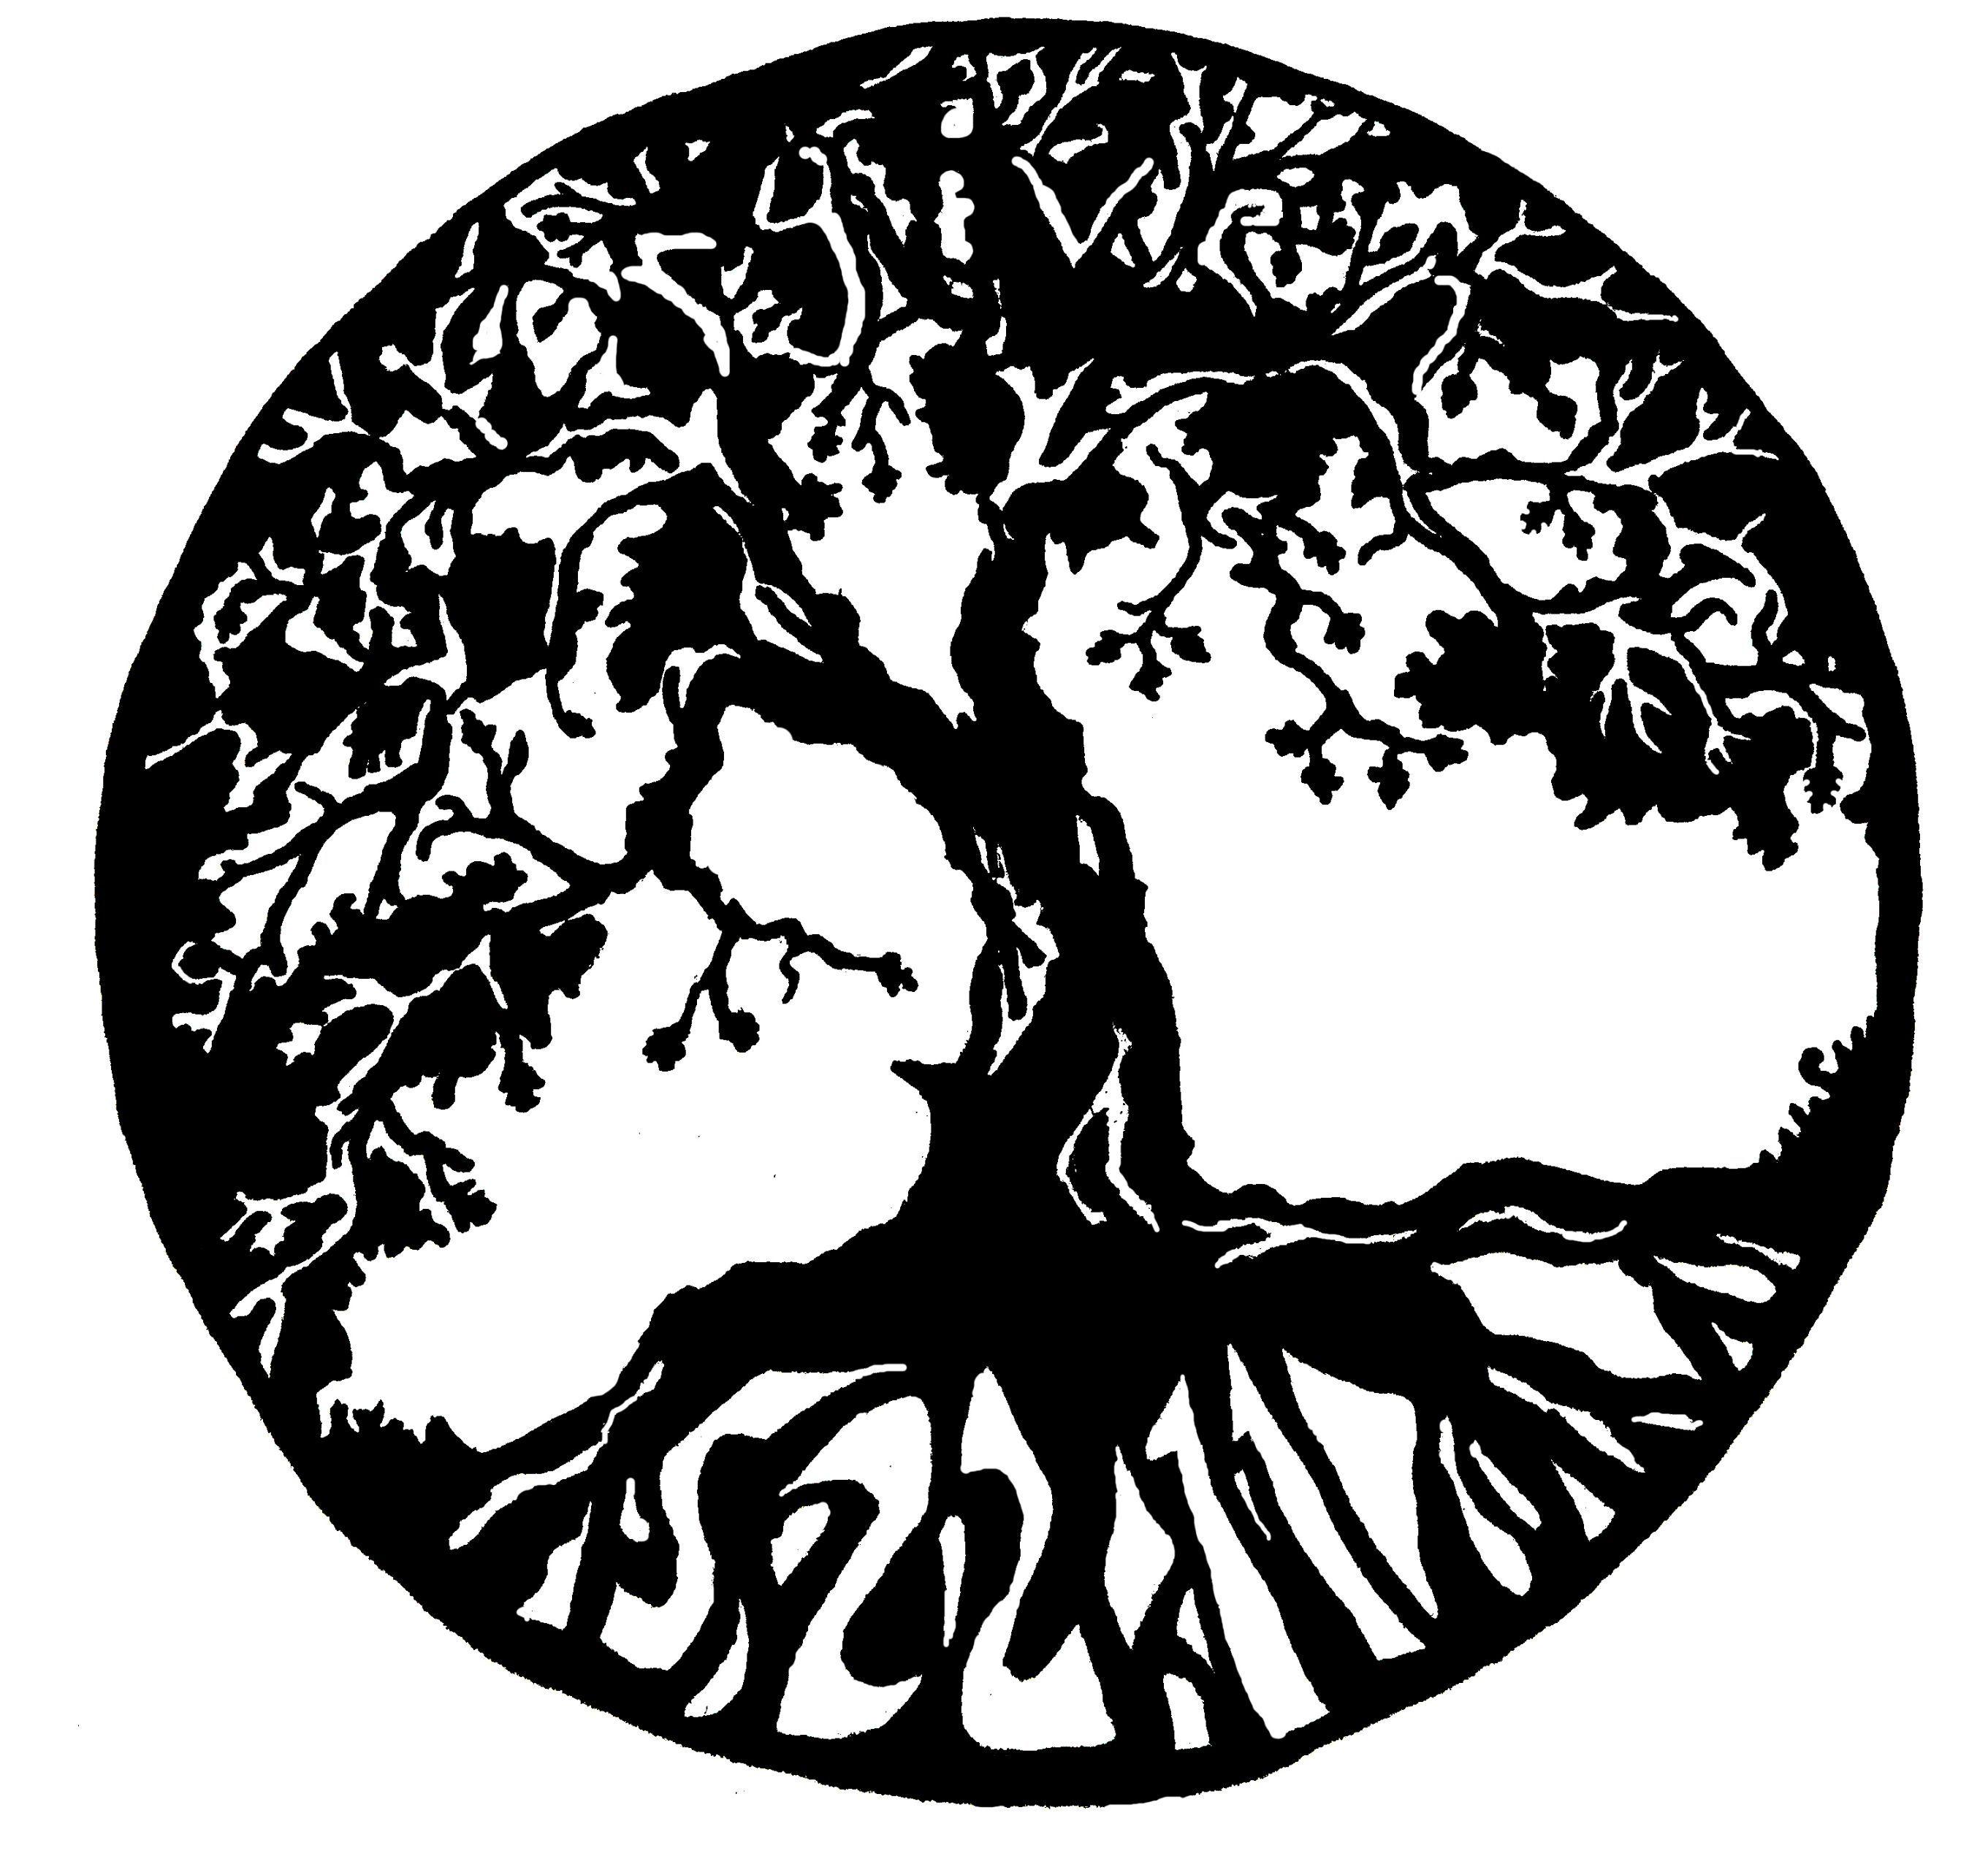 tree tattoo designs madscar tattoos. Black Bedroom Furniture Sets. Home Design Ideas